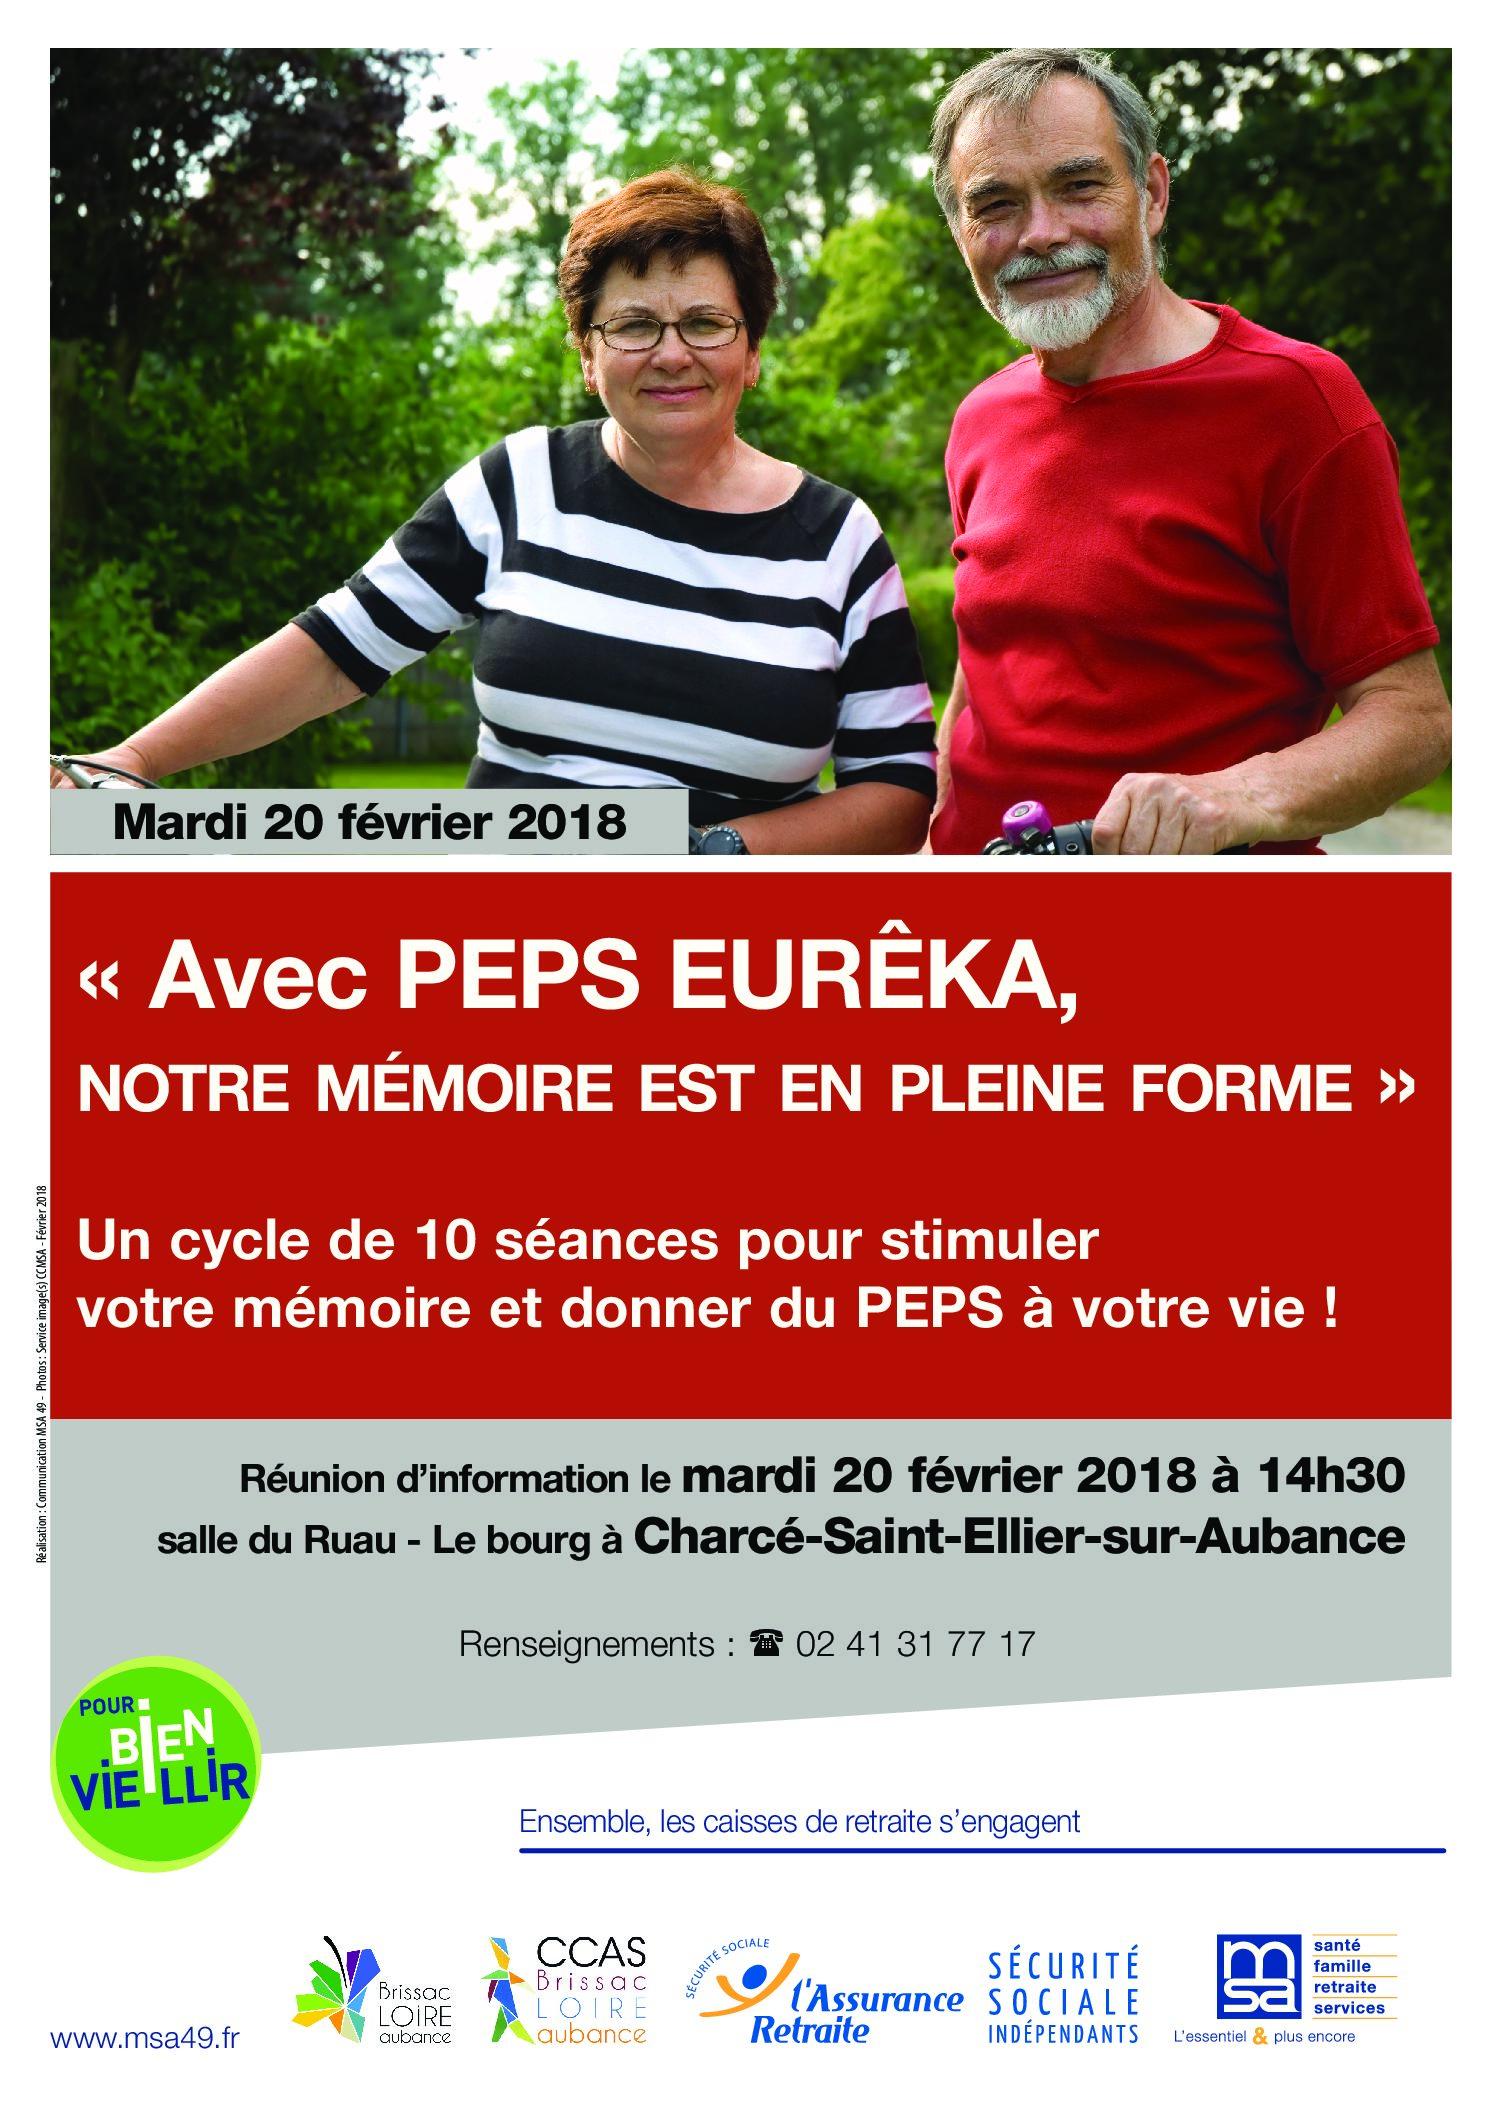 Affiche PEPS eureka Brissac